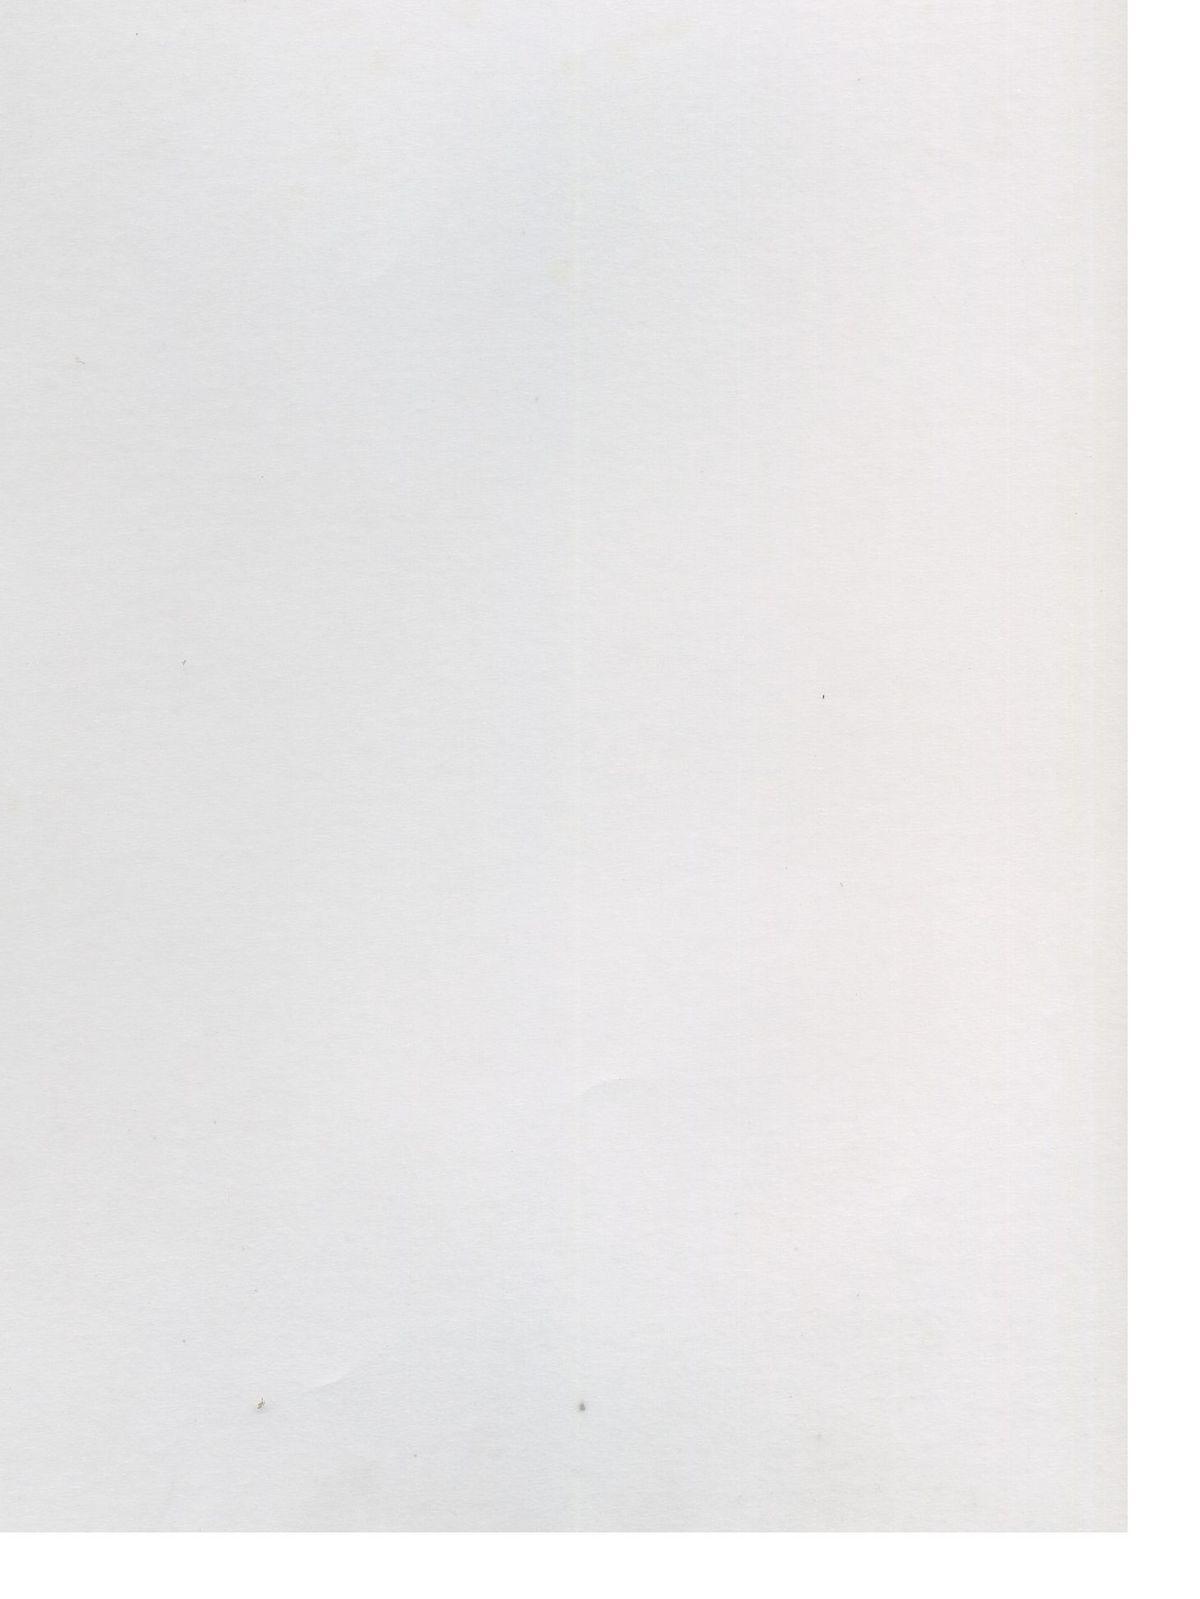 Opalux Translucent Paper